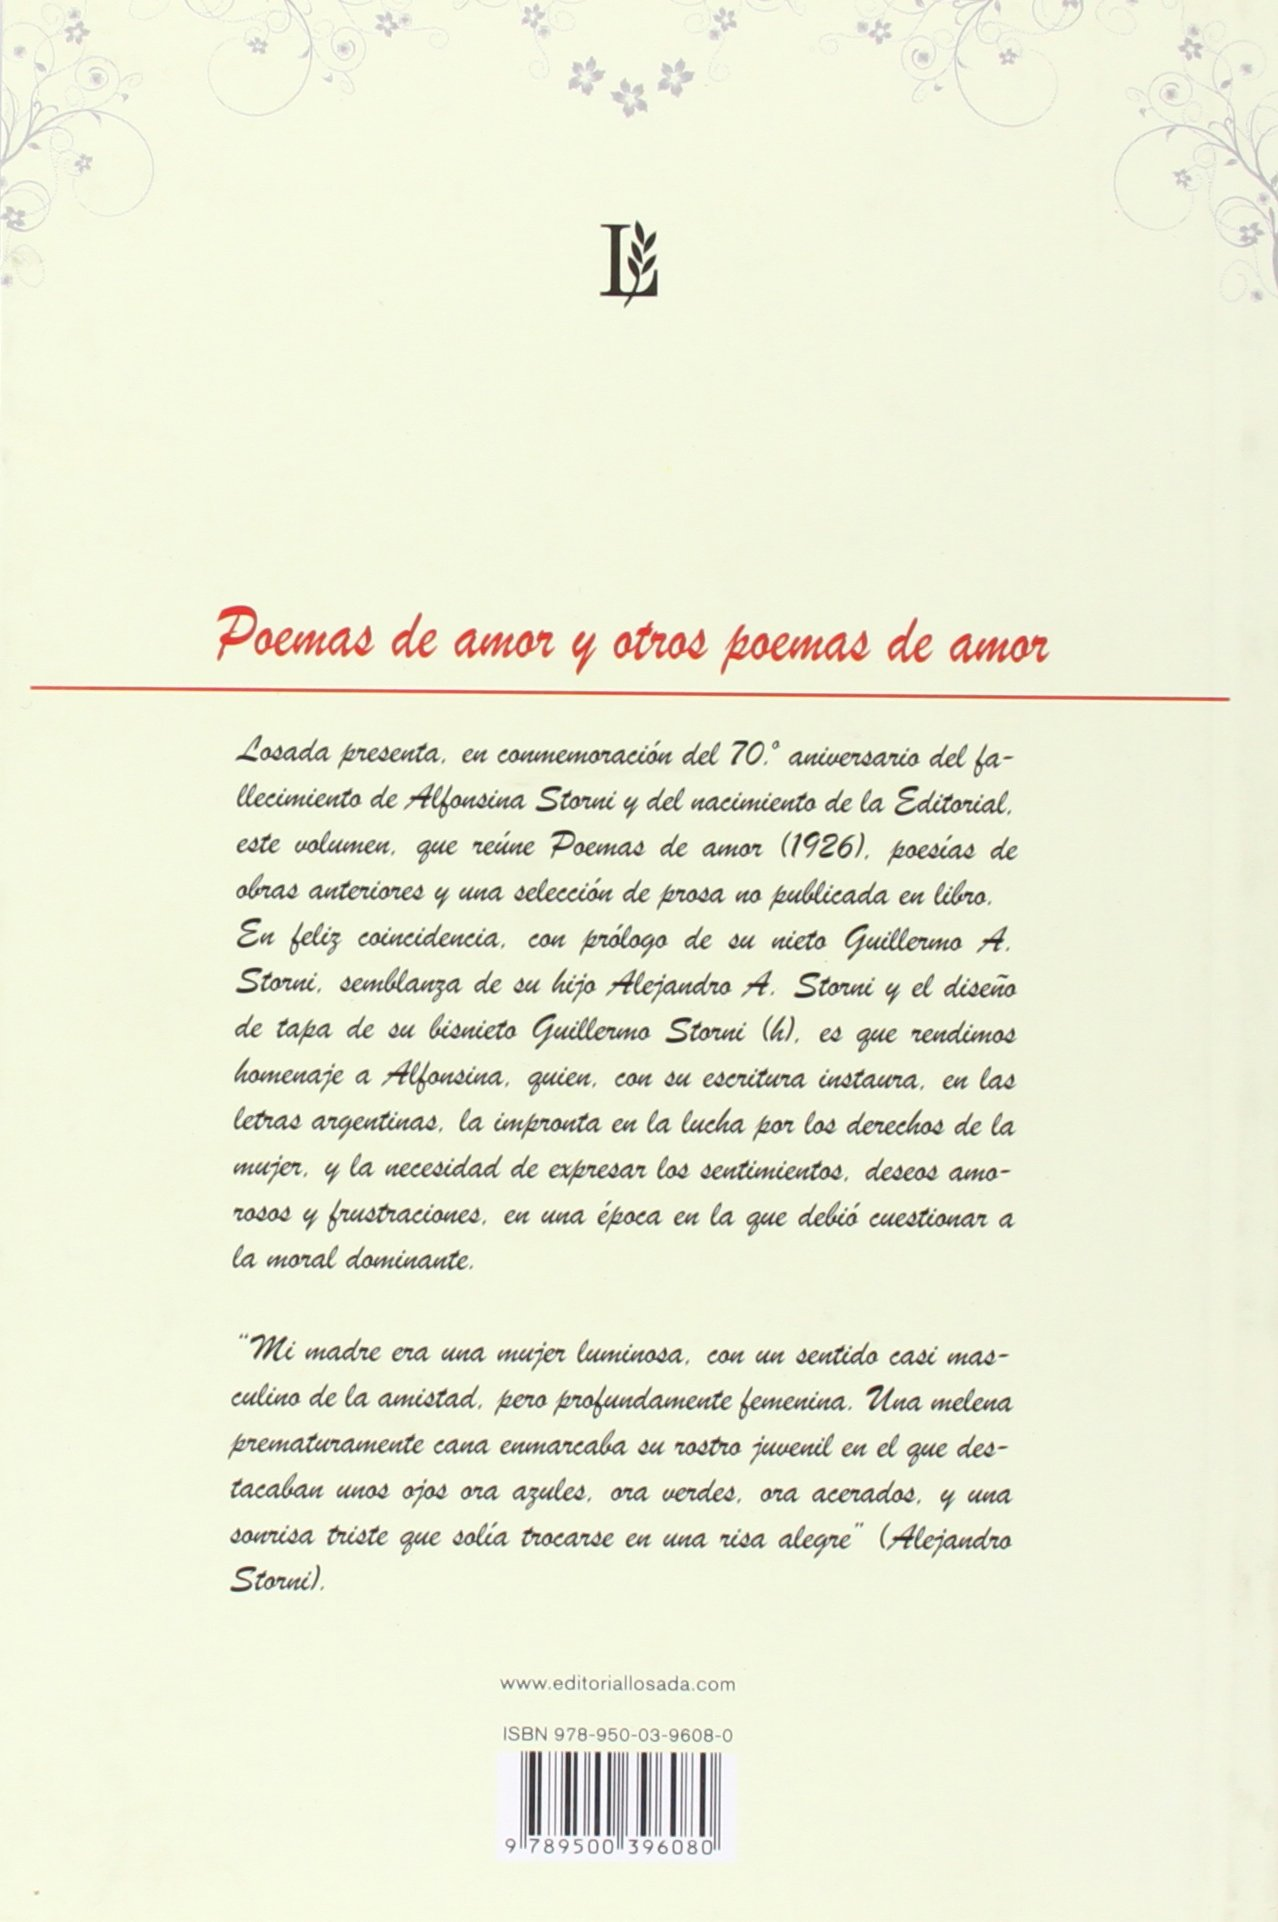 Poemas de amor y otros poemas de amor (Spanish Edition): Alfonsina Storni:  9789500396080: Amazon.com: Books